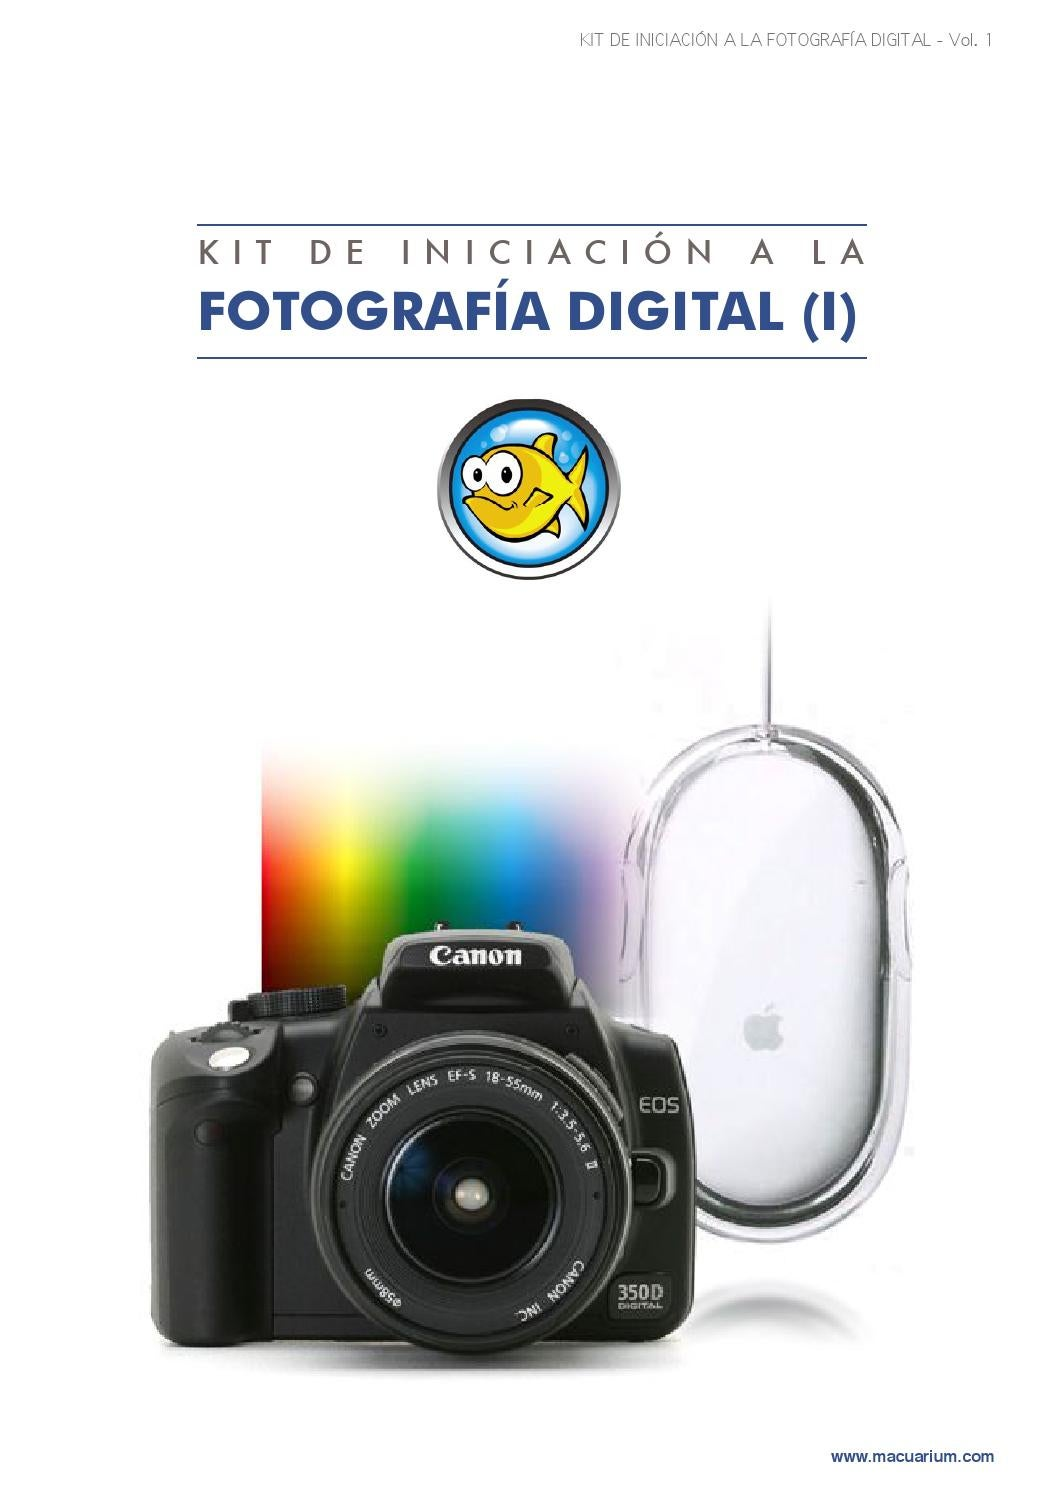 08 kit de iniciacion a la fotografia digital by Jorge Alonso - issuu